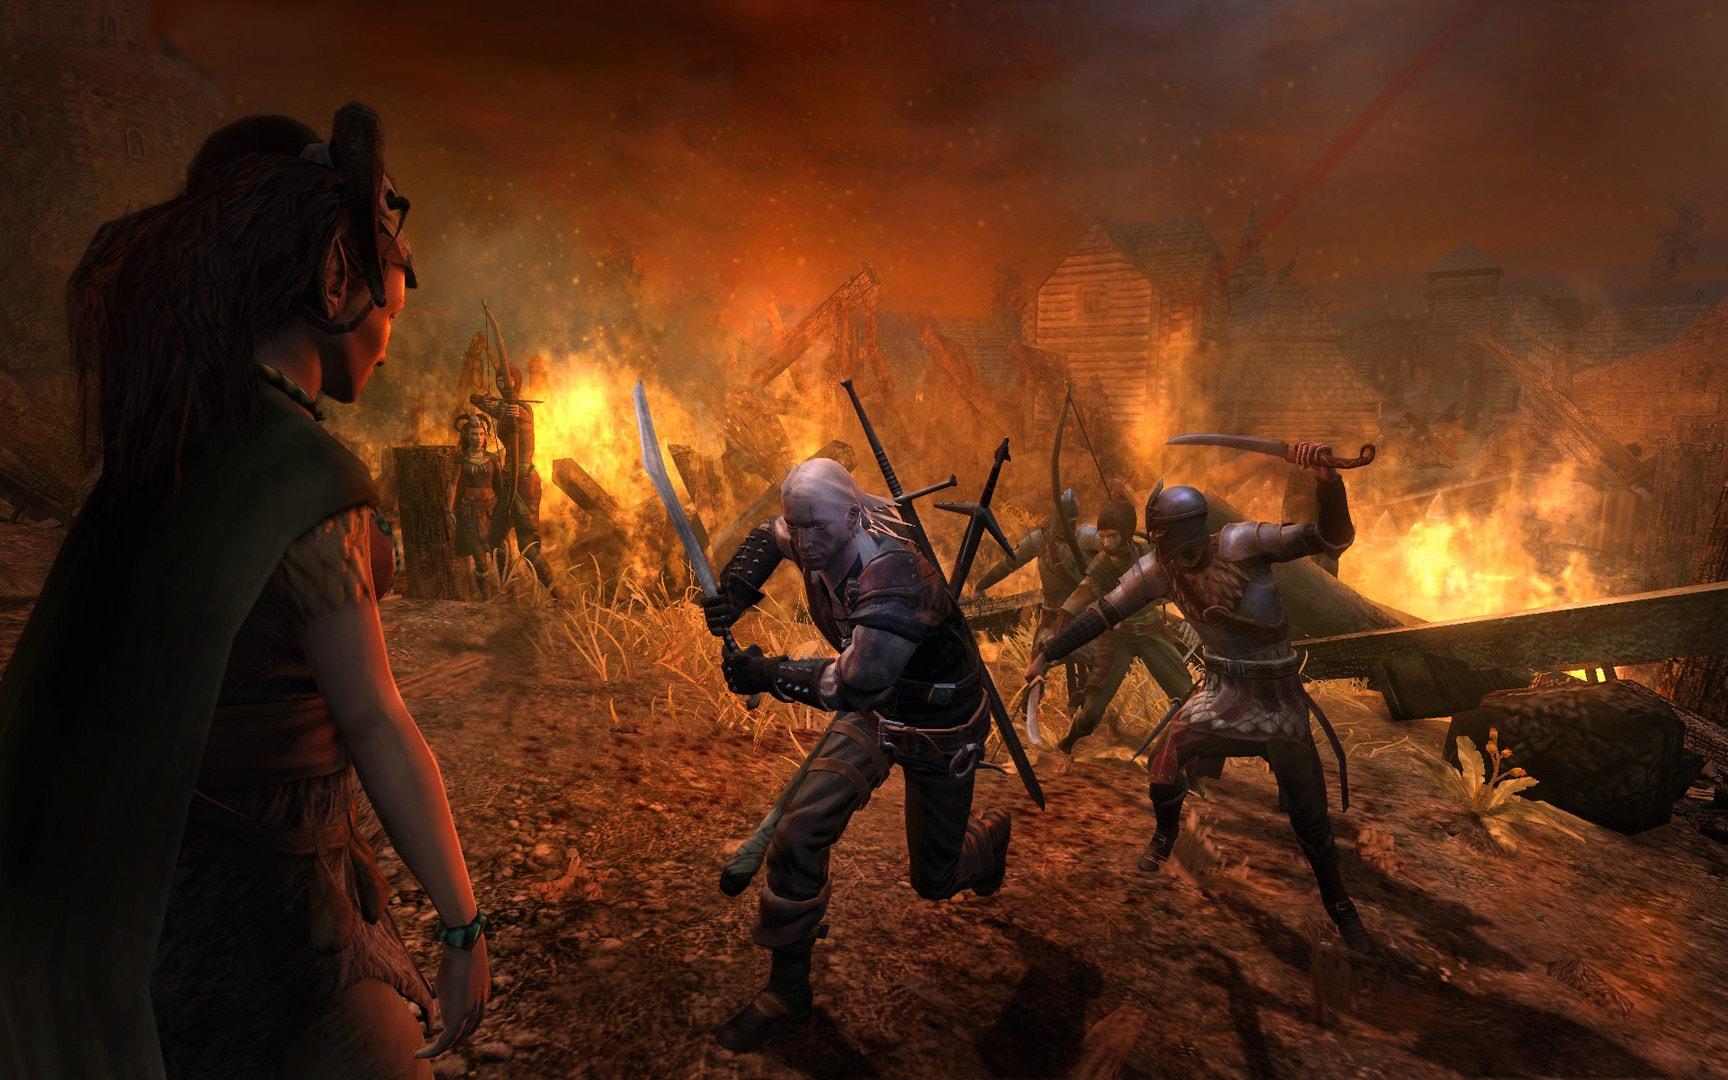 The Witcher: Enhanced Edition Director's Cut GOG.COM Key GLOBAL - 3